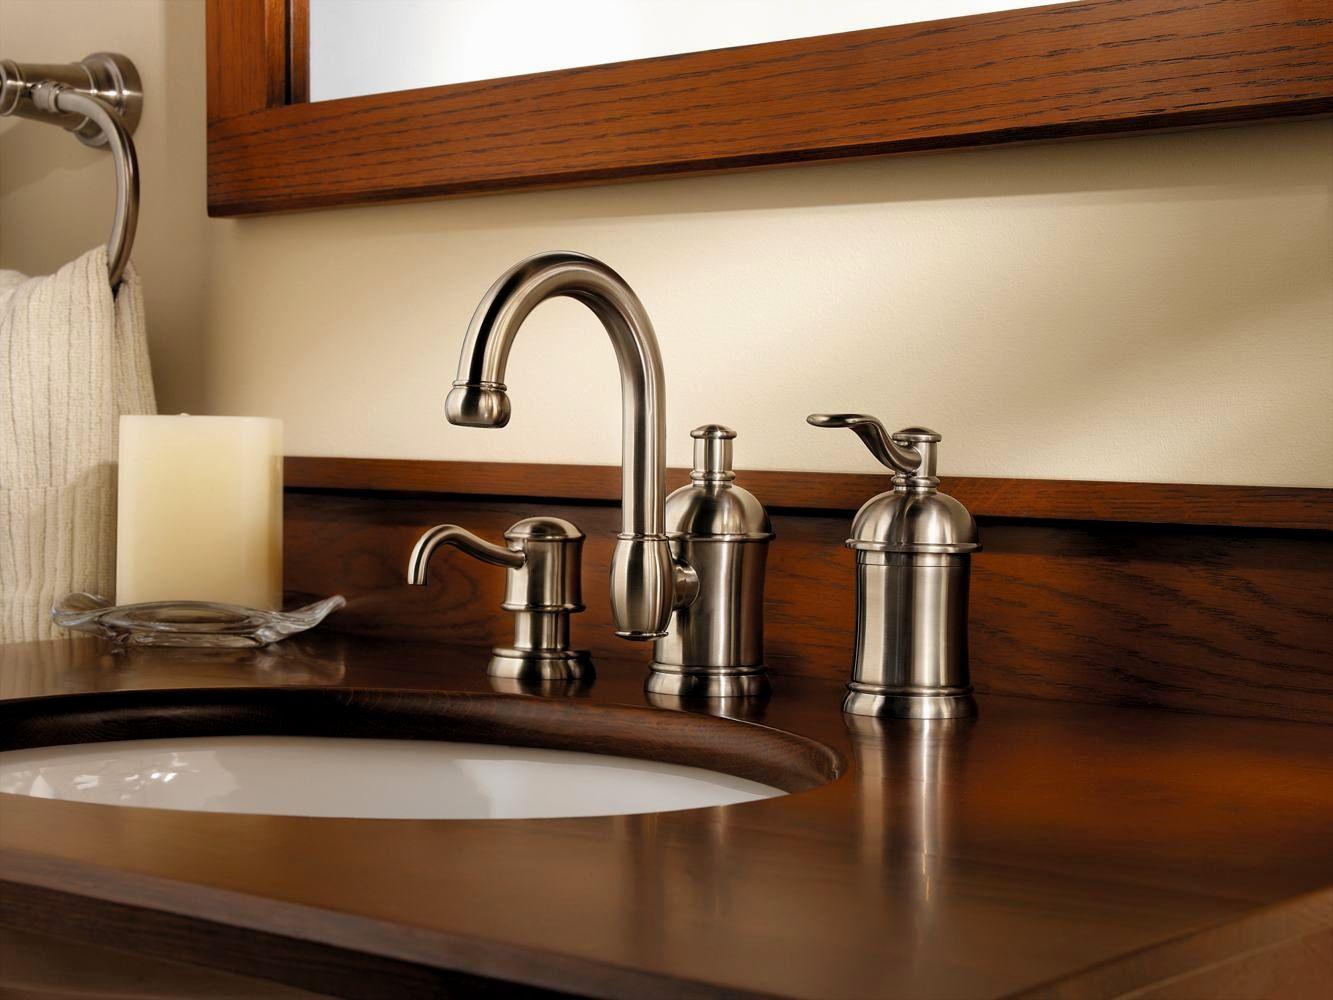 incredible small bathroom sinks layout-Fresh Small Bathroom Sinks Plan